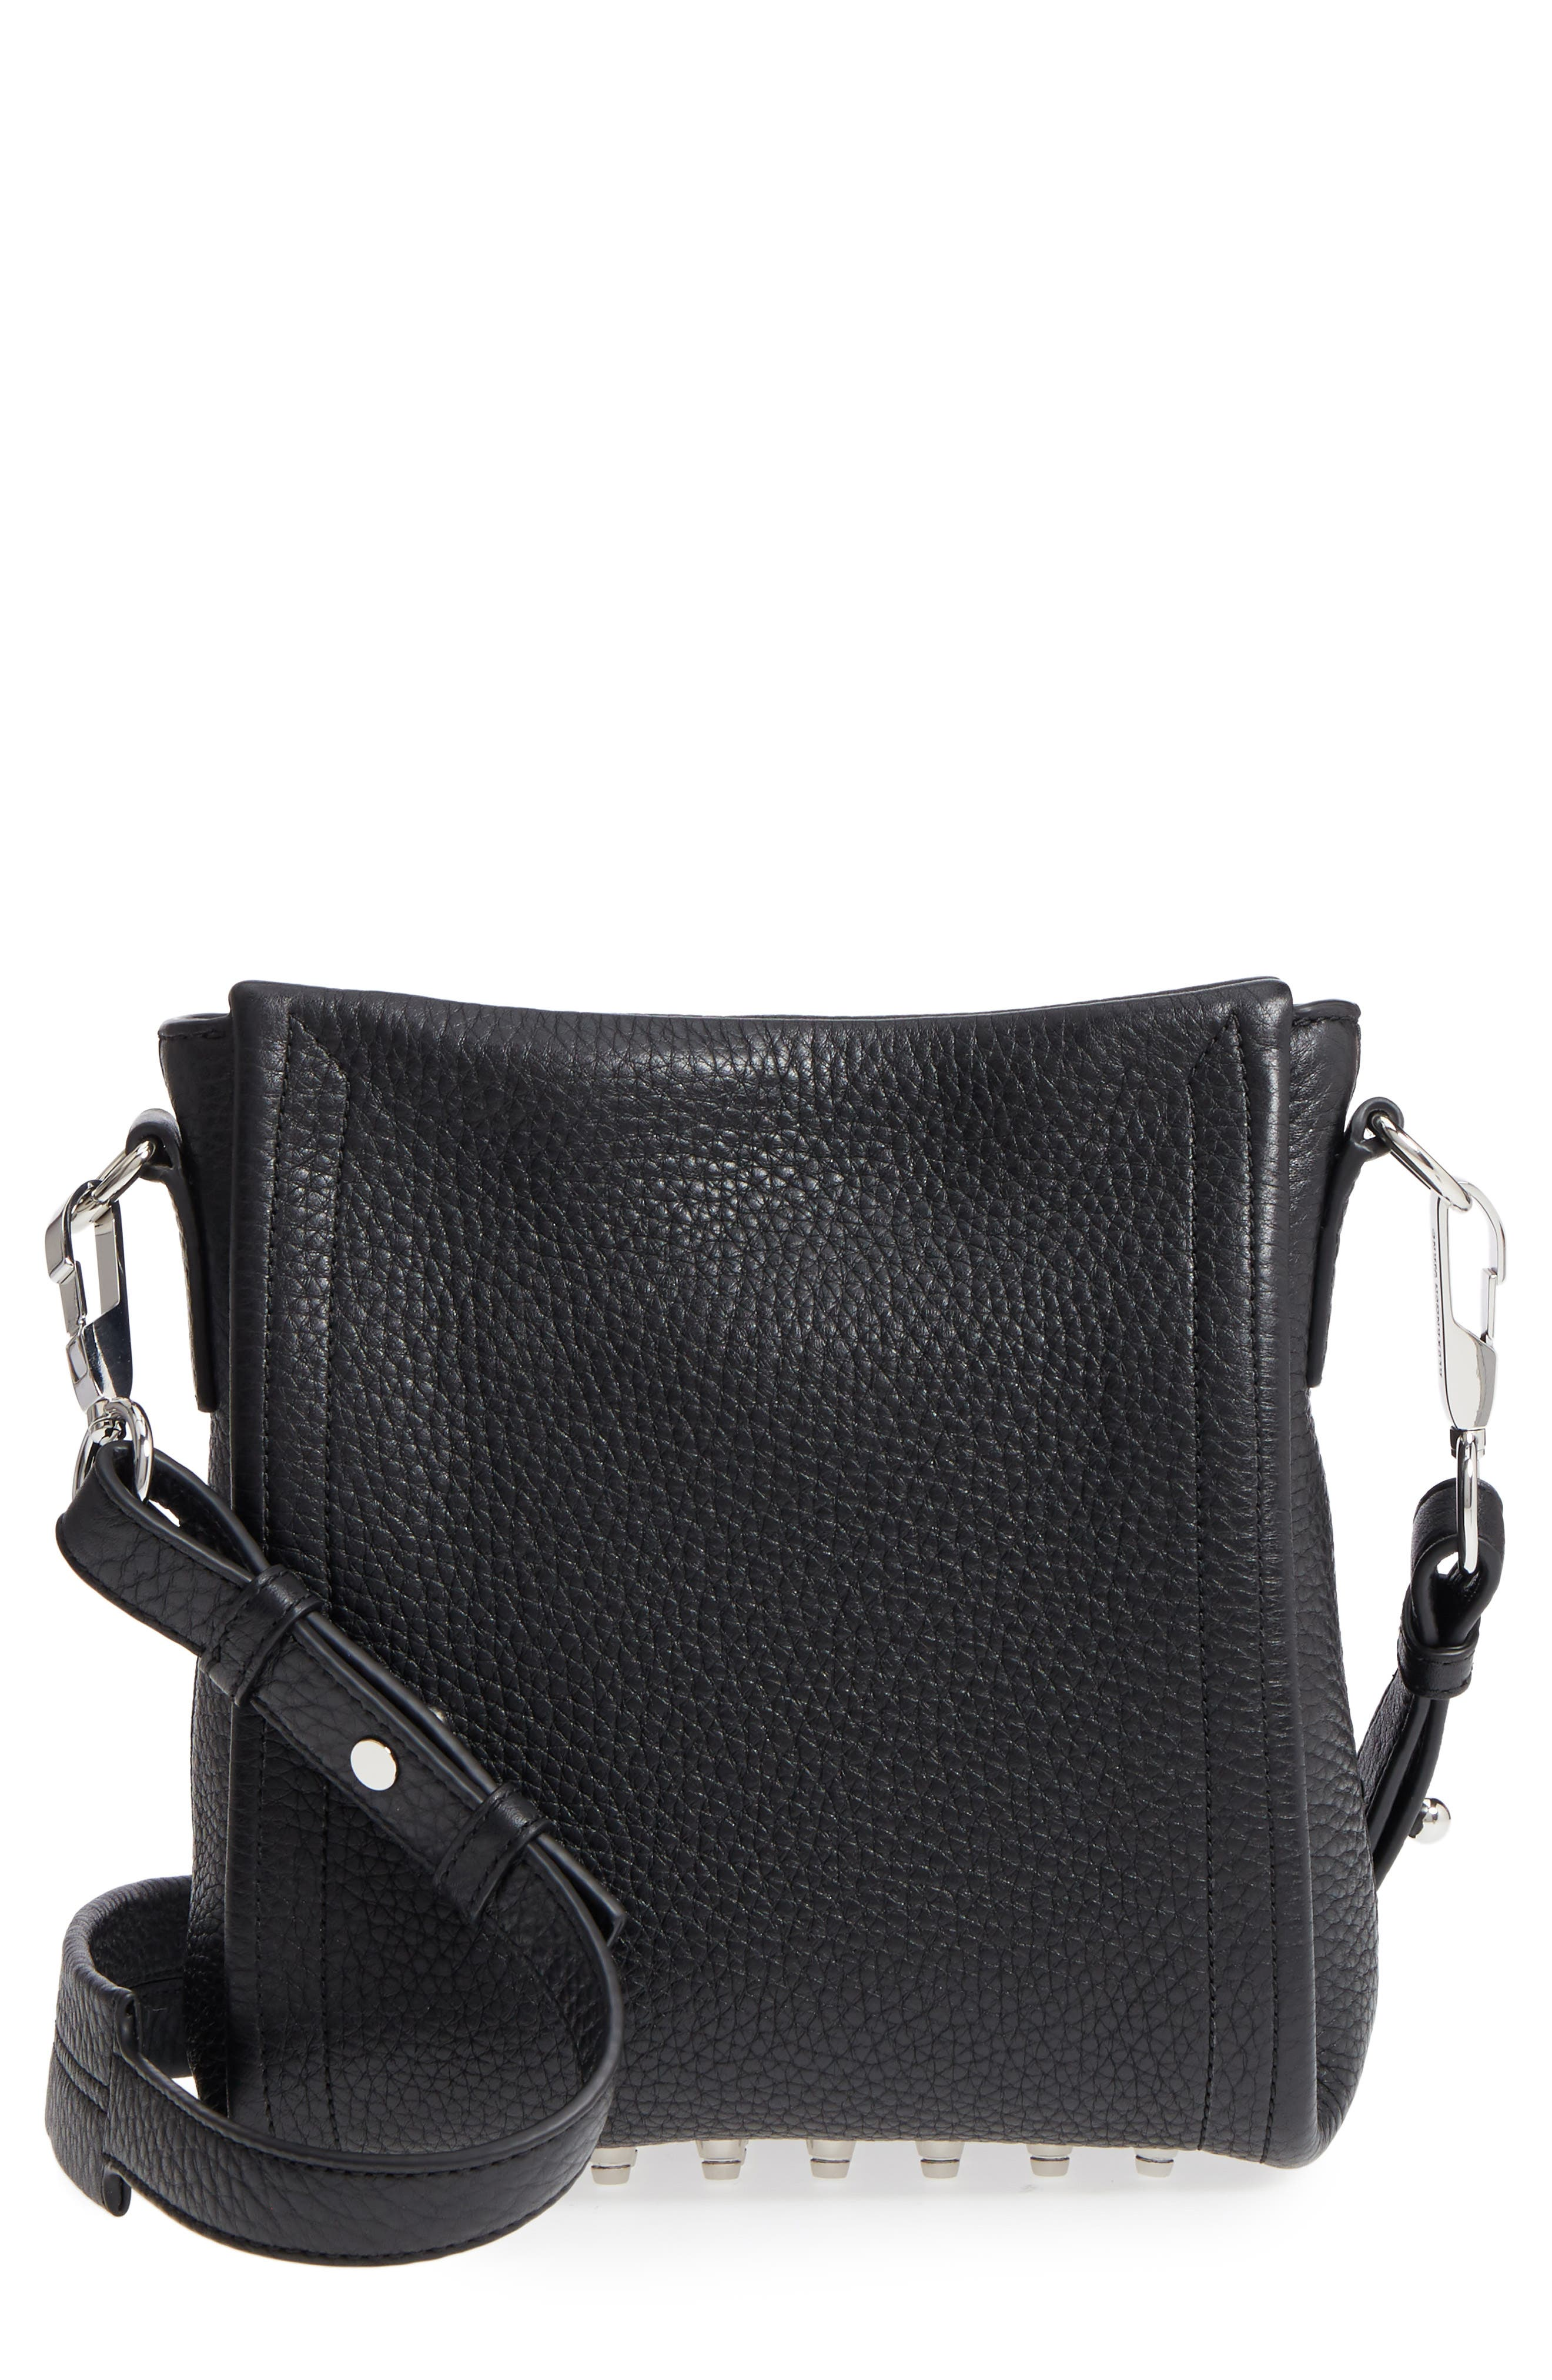 Alternate Image 1 Selected - Alexander Wang Mini Darcy Leather Shoulder Bag